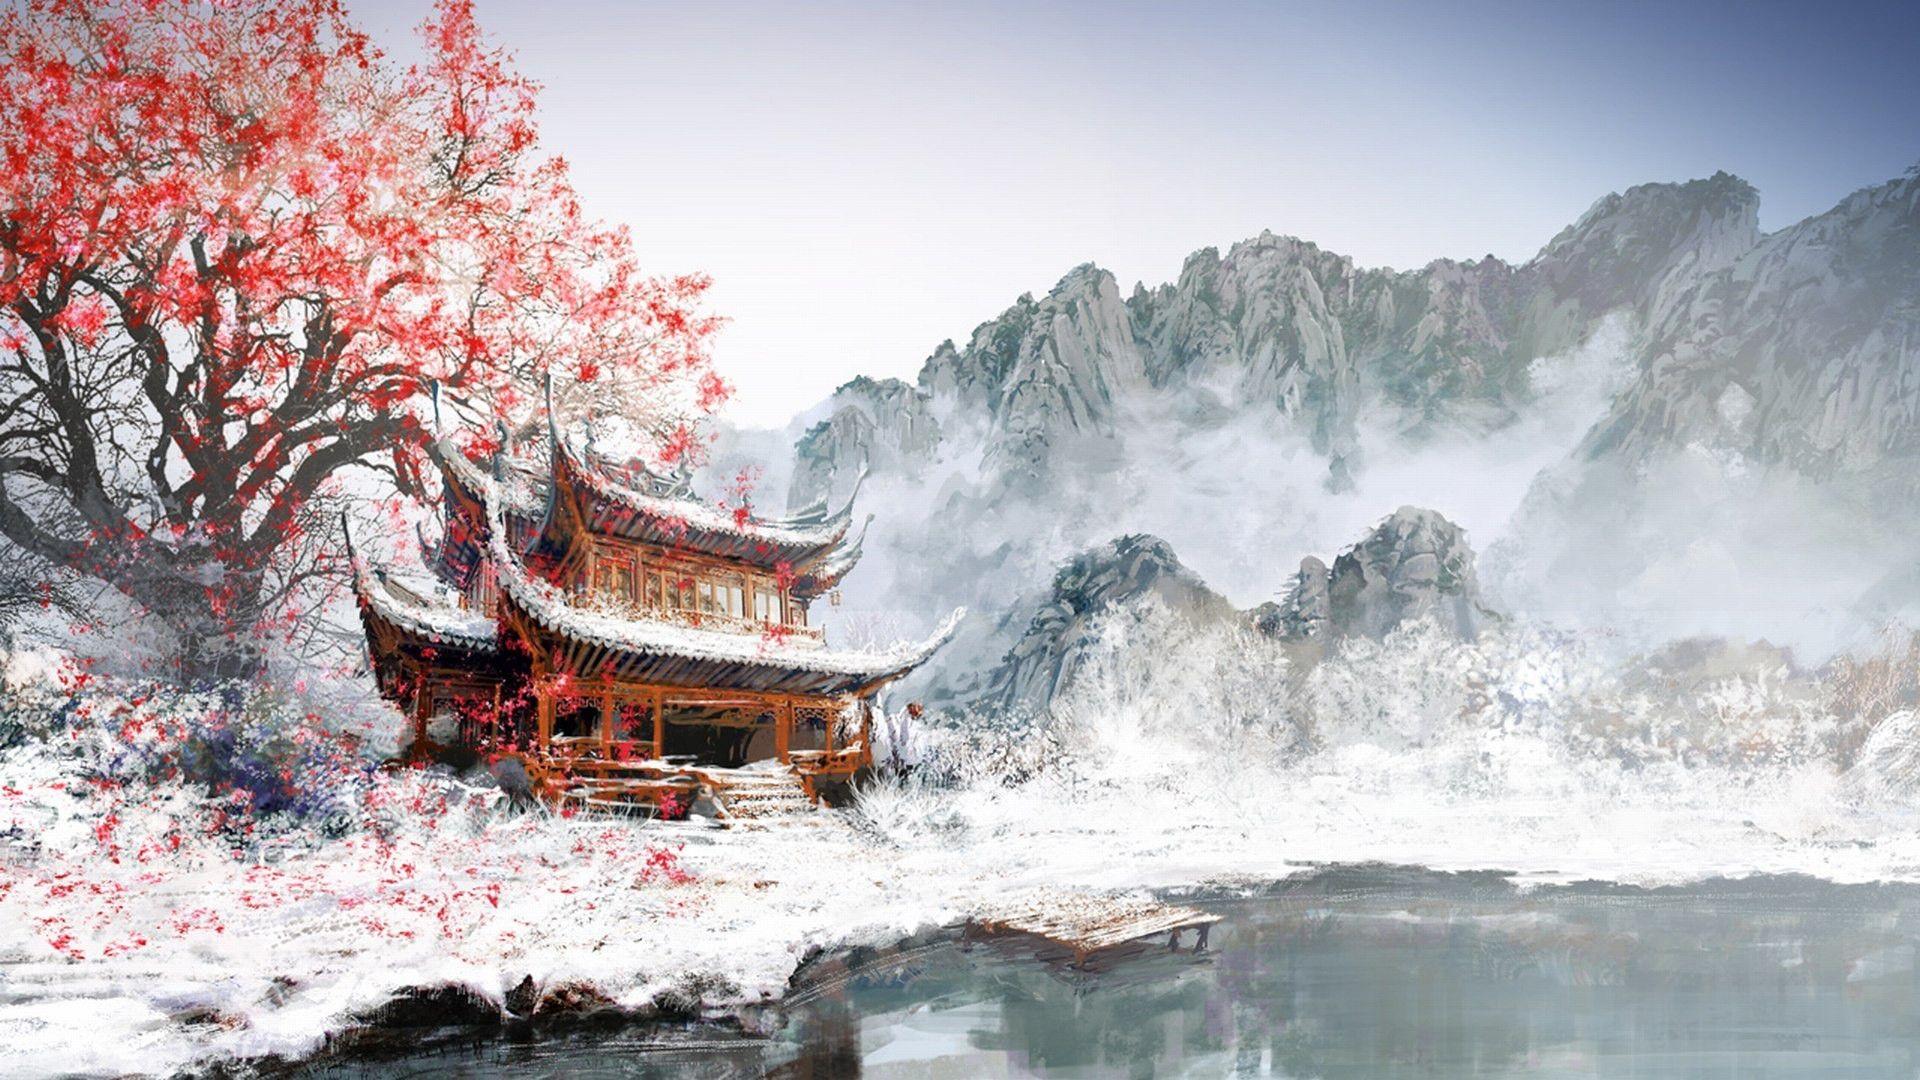 Art fantasy landscape wallpapers 1080p